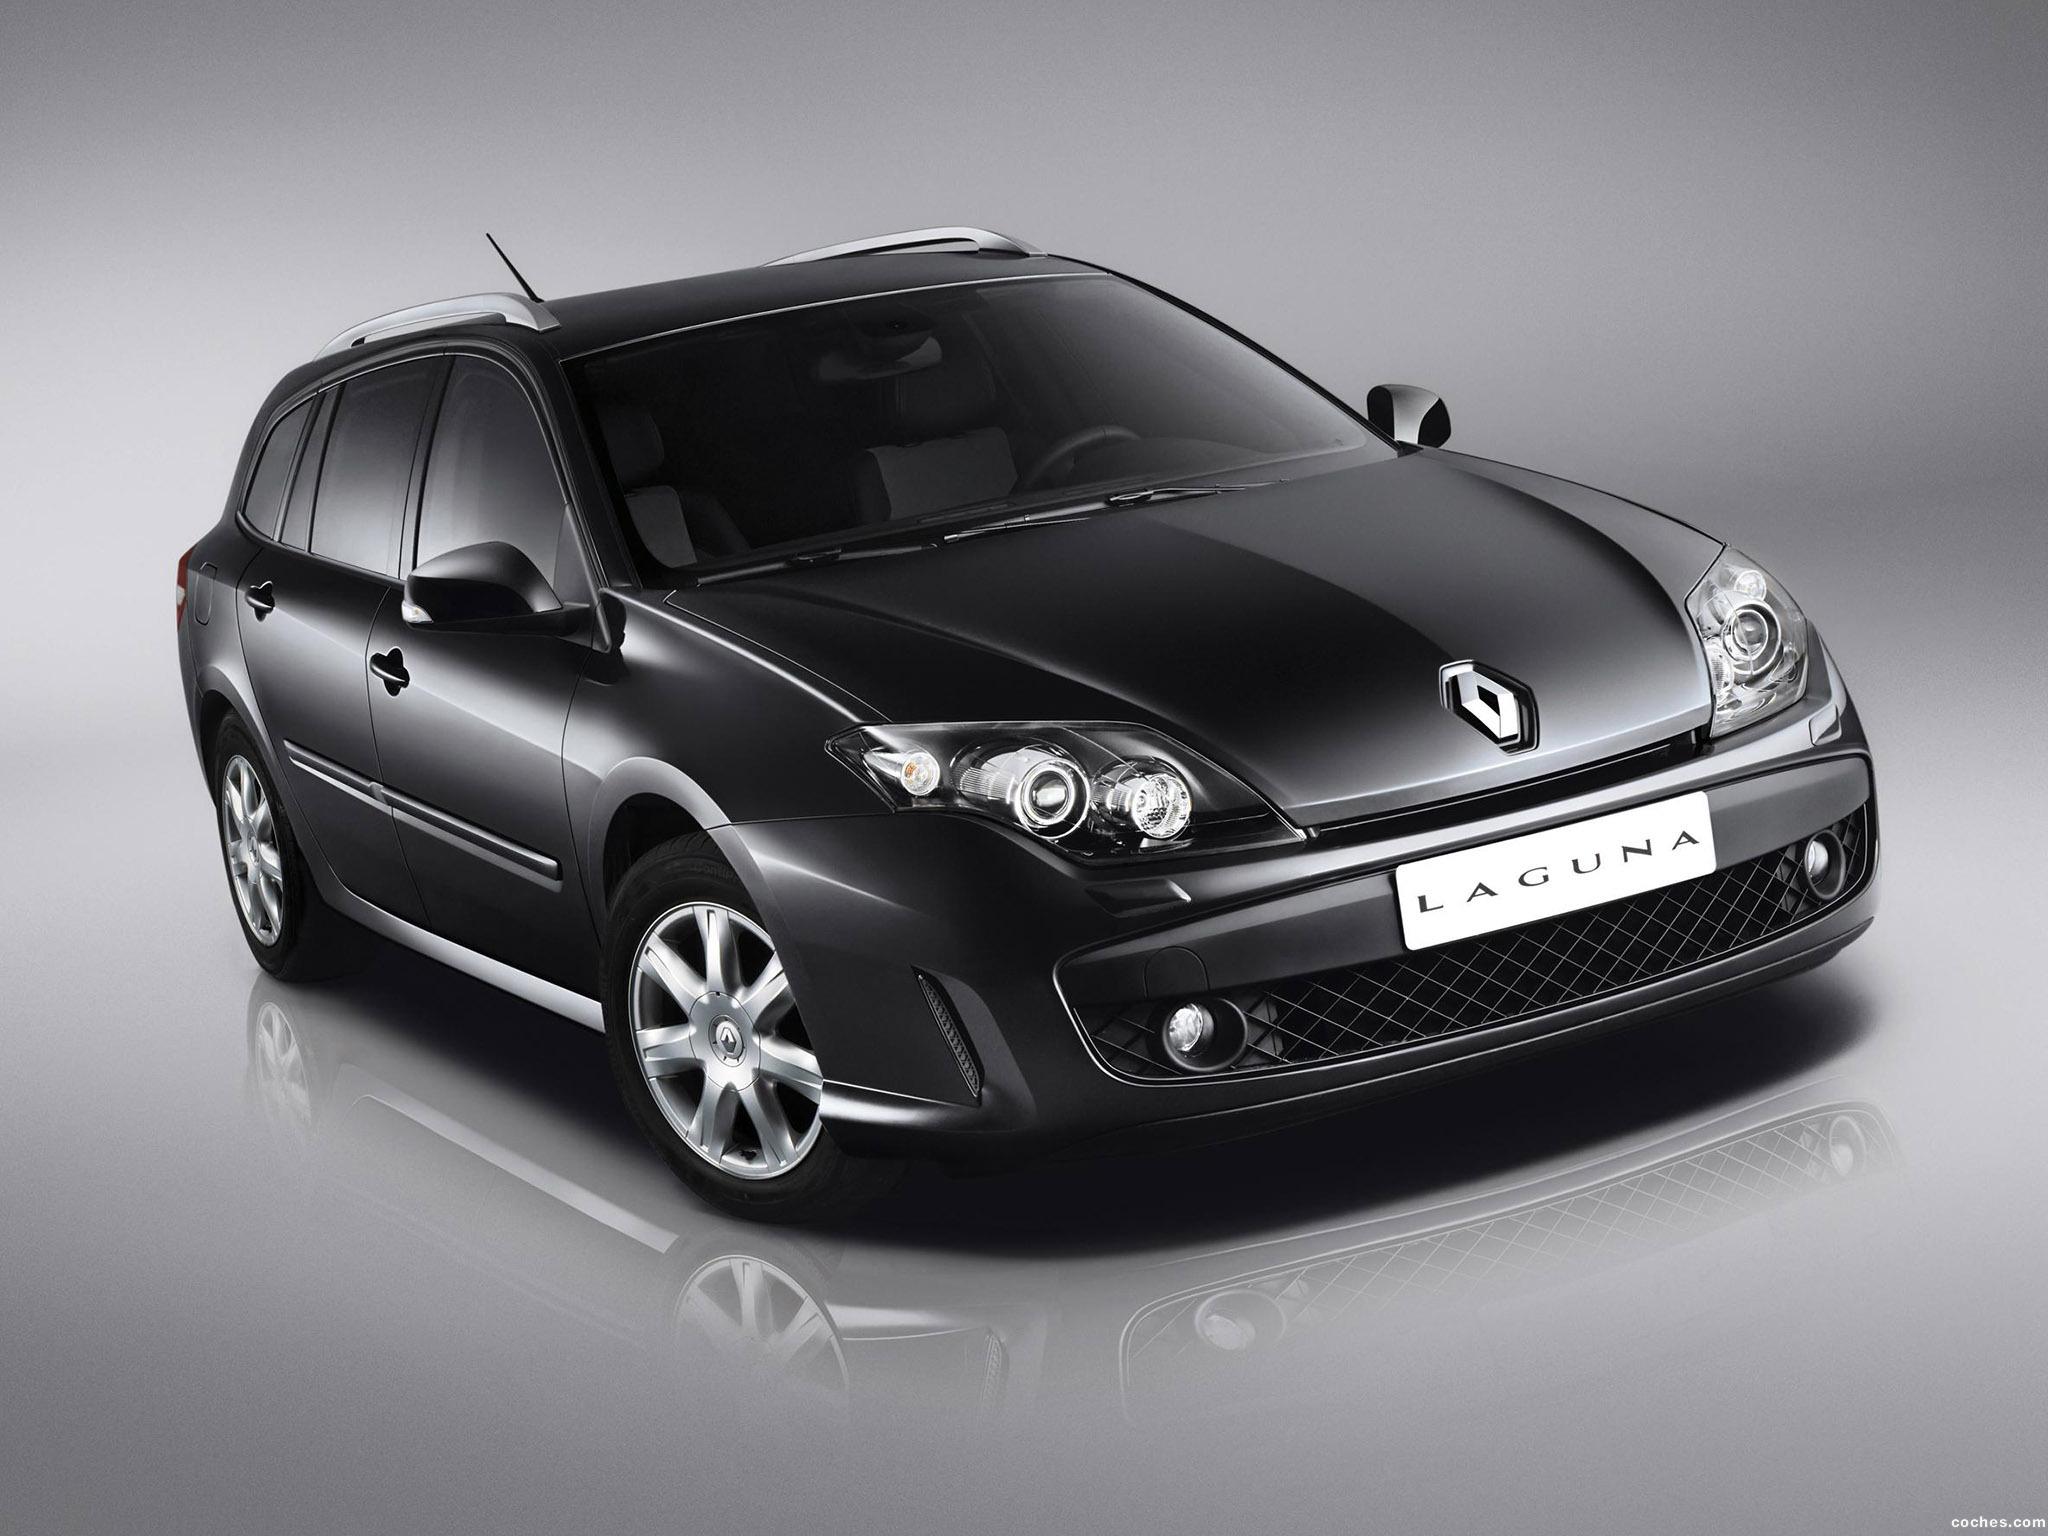 Foto 0 de Renault Laguna Black Edition 2009